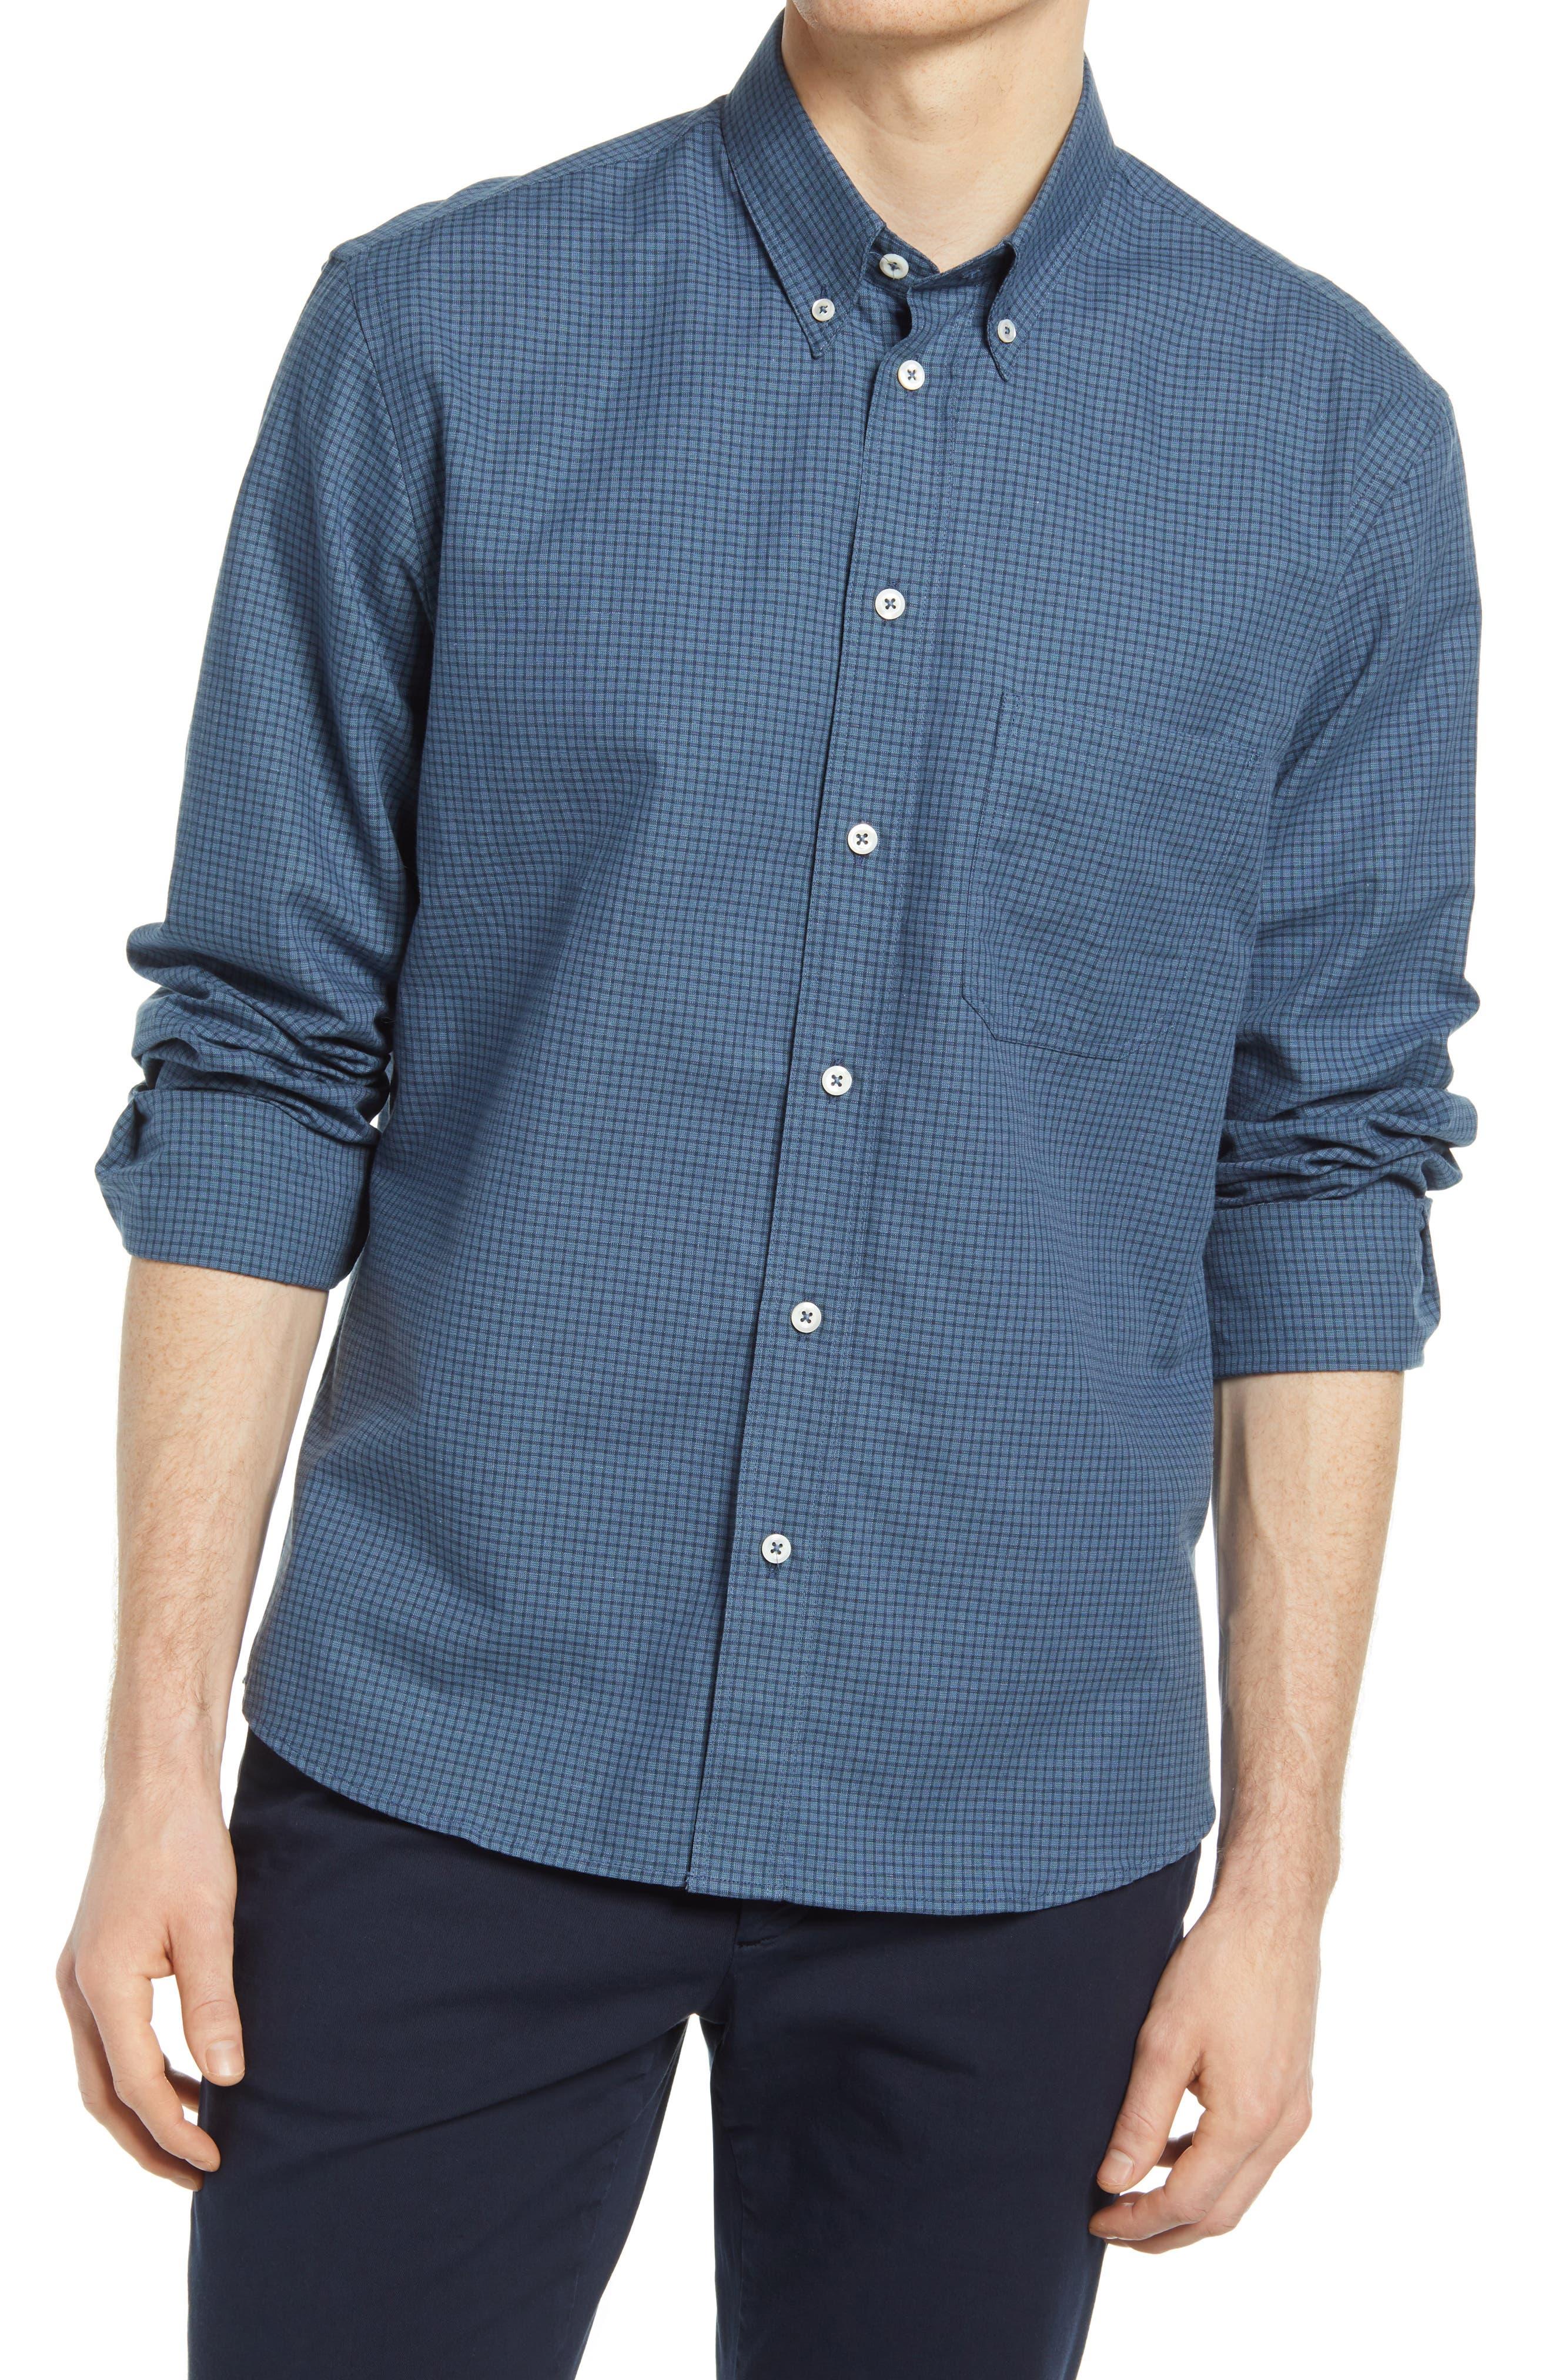 Tuscumbia Check Cotton & Linen Button-Down Shirt